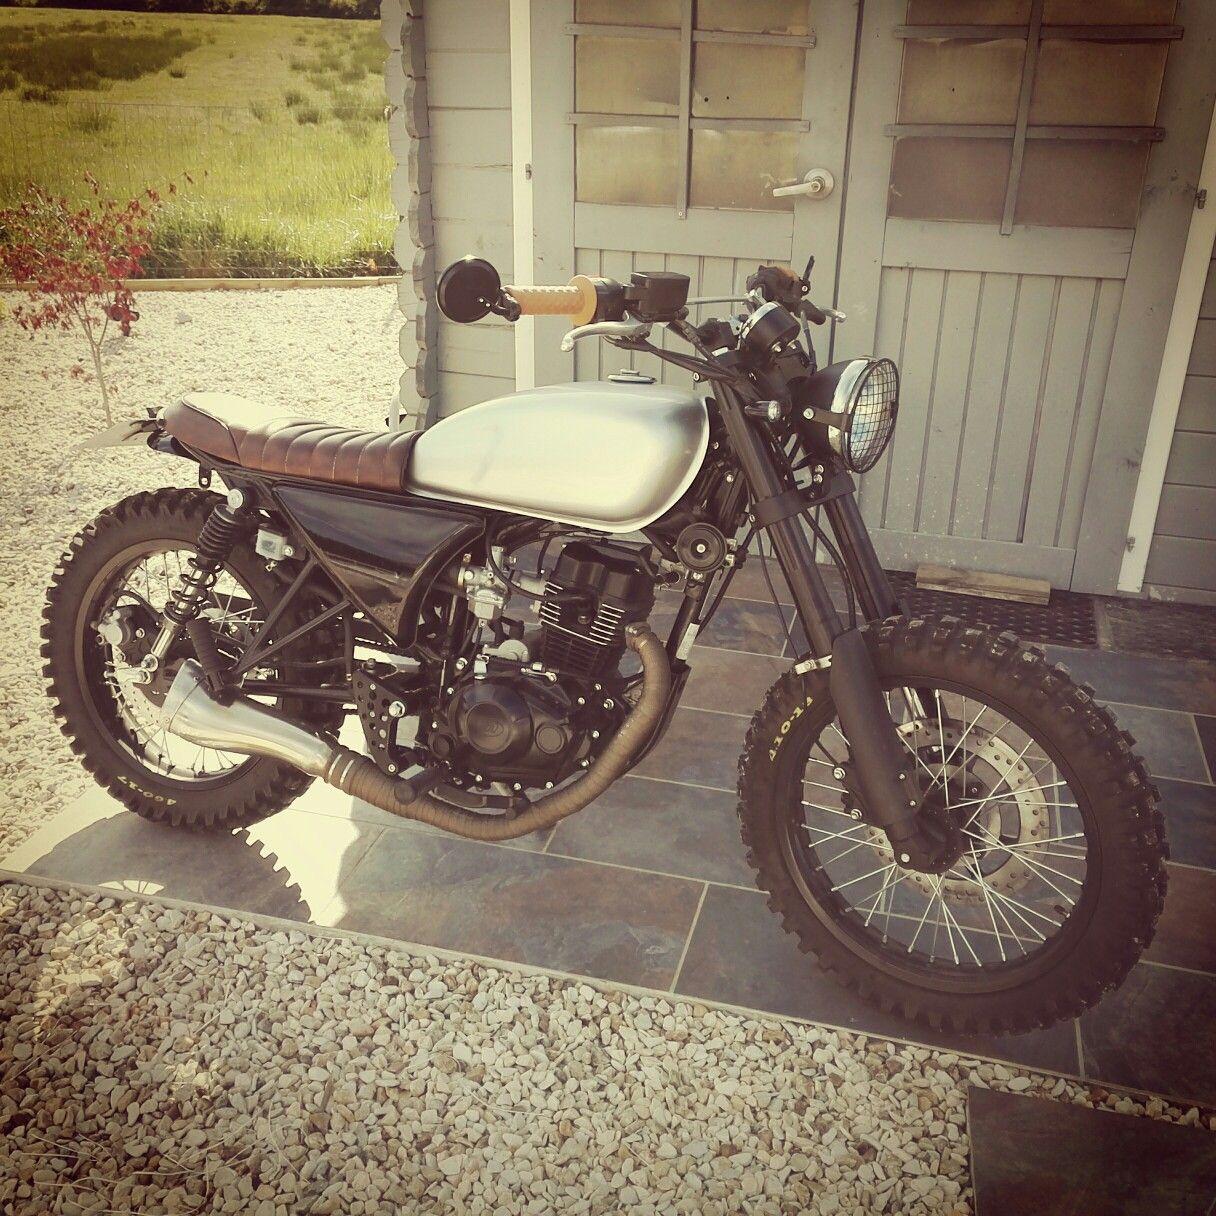 masai 125 scrambler modifi motorcycle dirtbike pinterest scrambler scrambler. Black Bedroom Furniture Sets. Home Design Ideas